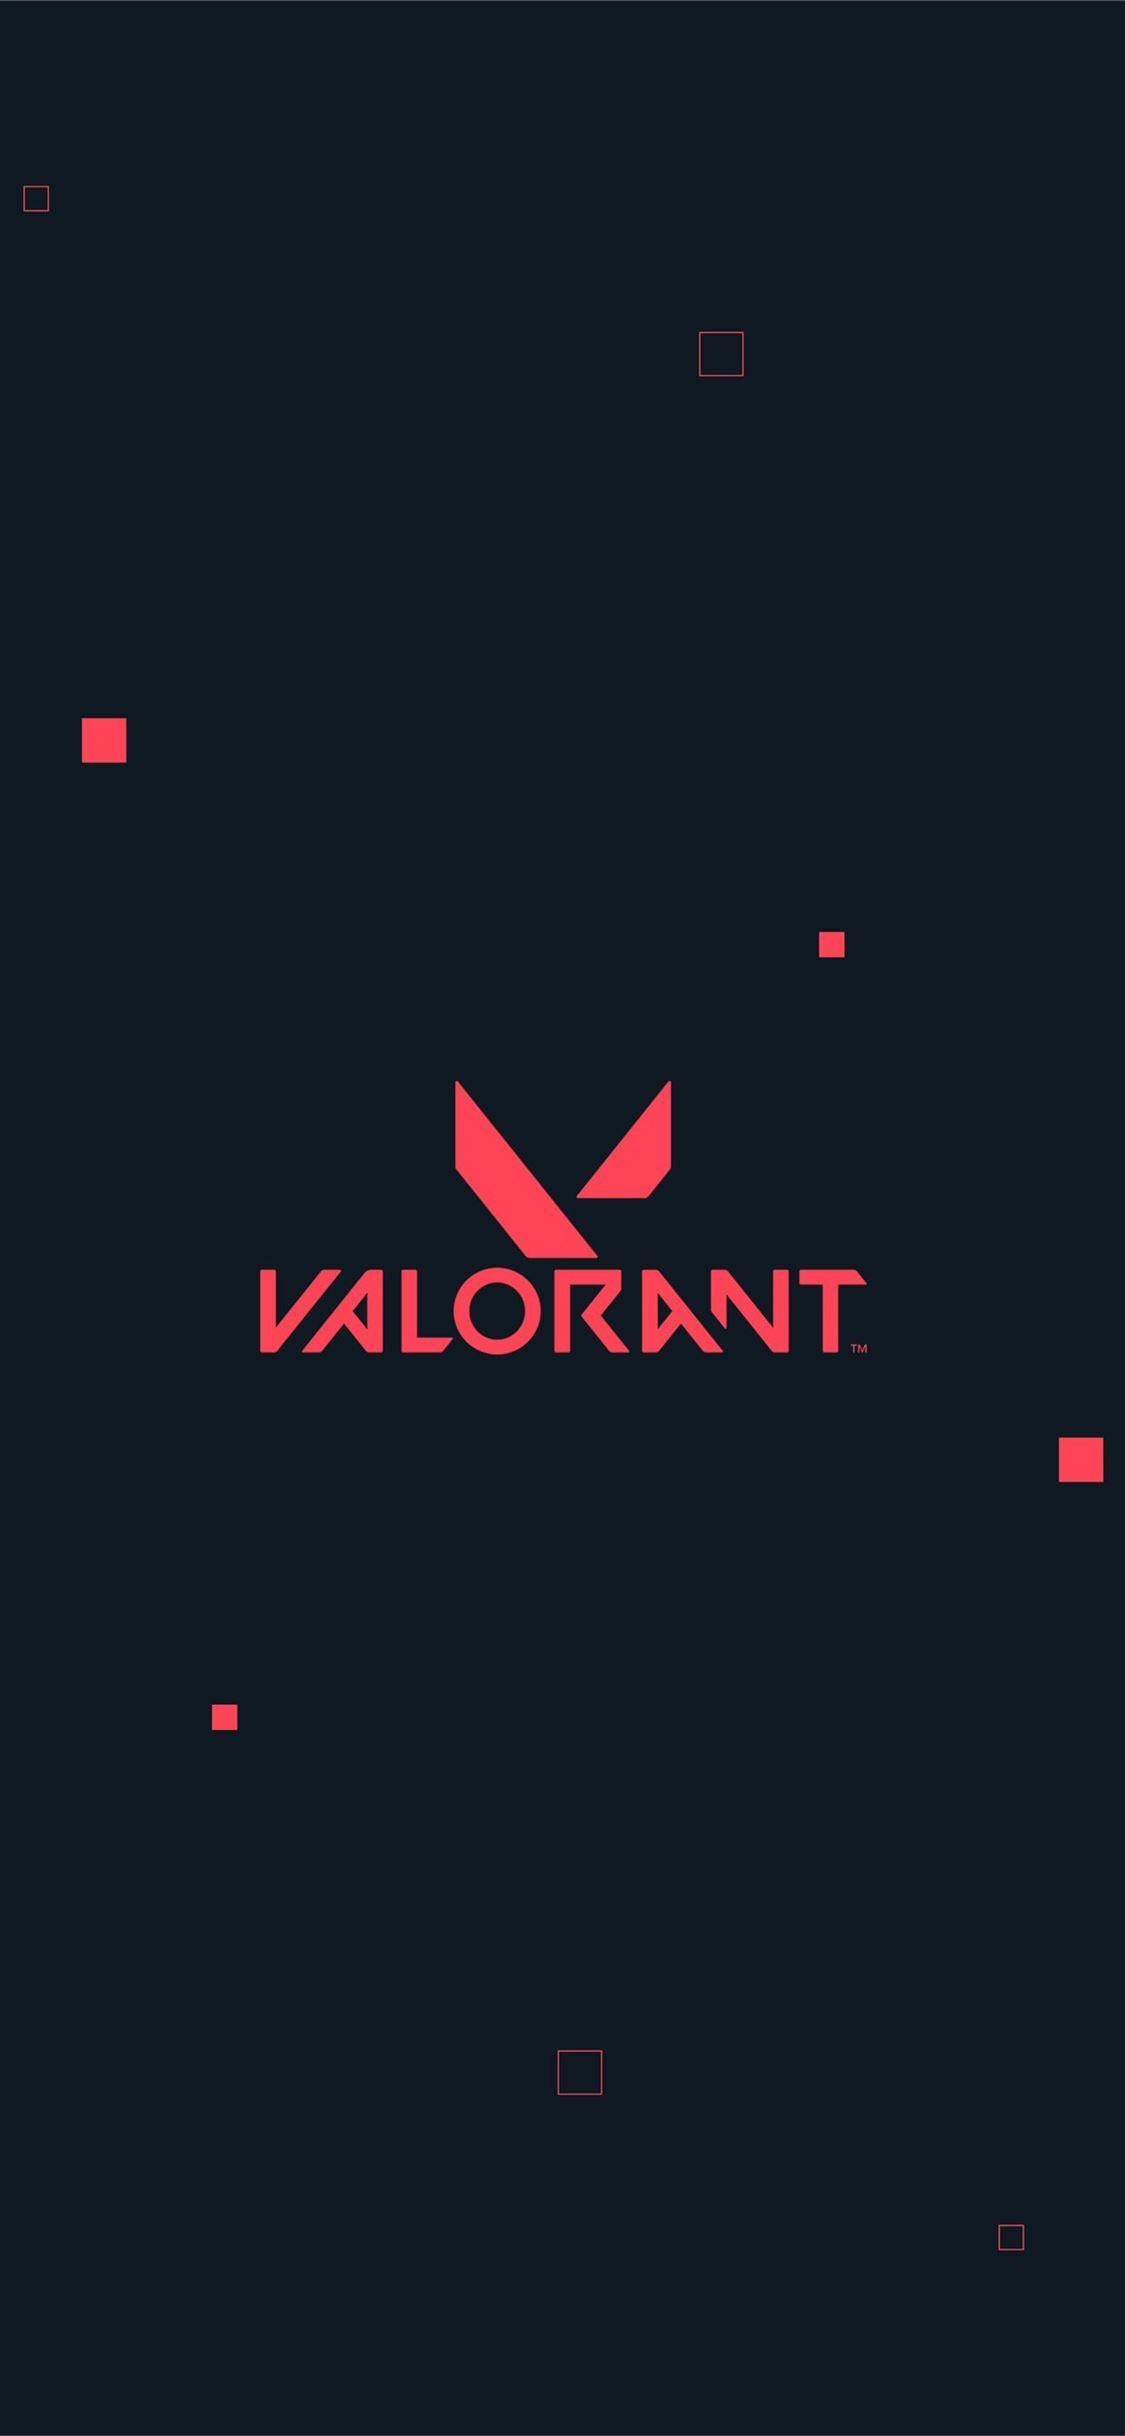 Valorant Logo 4k Valorant Games 4k 2020games Logo Minimalism Minimalist Iphone11wallpaper Iphone Wallpaper Gaming Wallpapers Logos